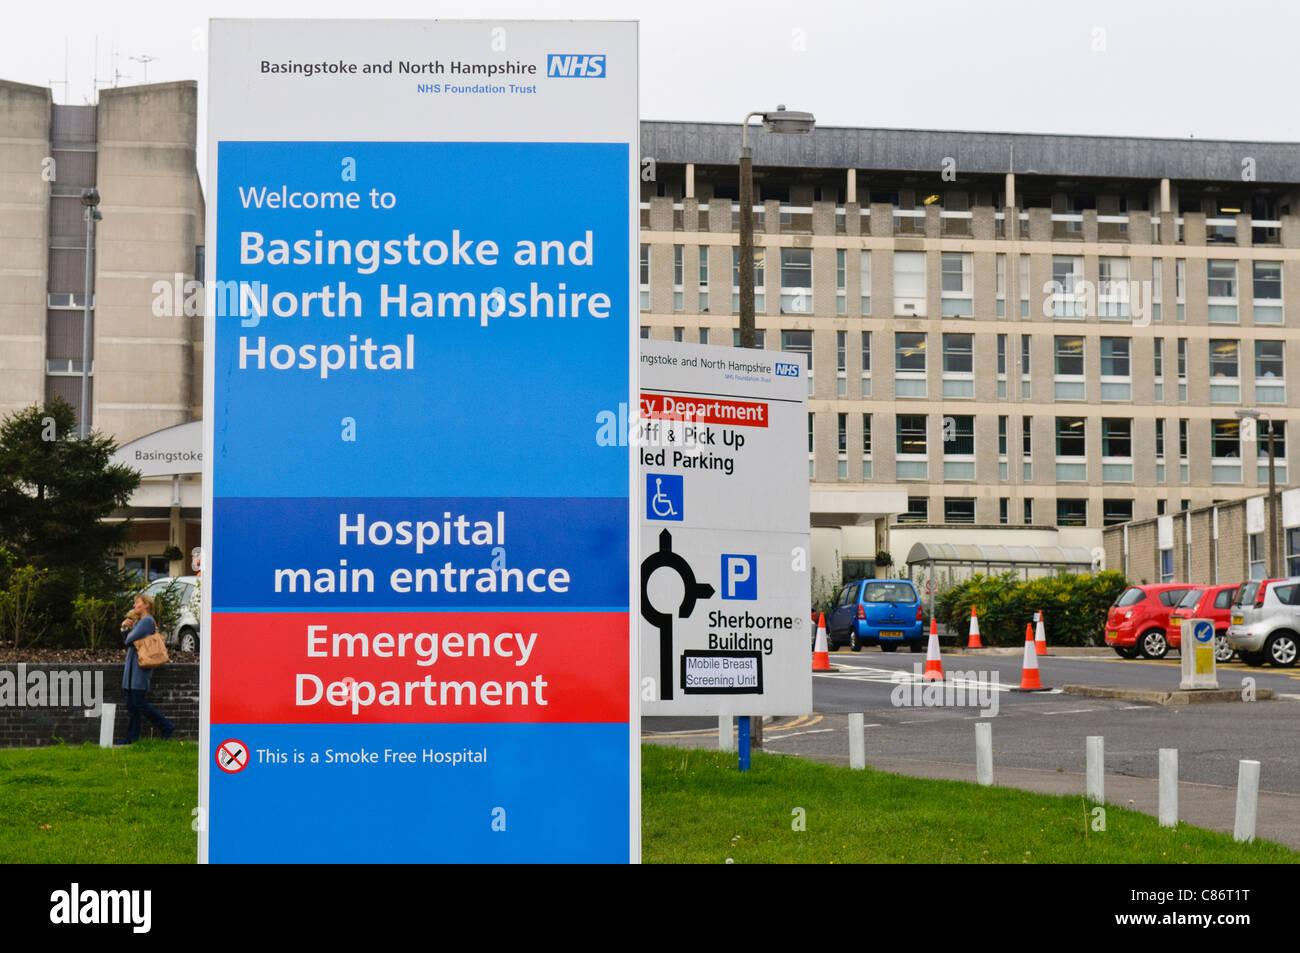 Basingstoke and North Hampshire Hospital Stock Photo